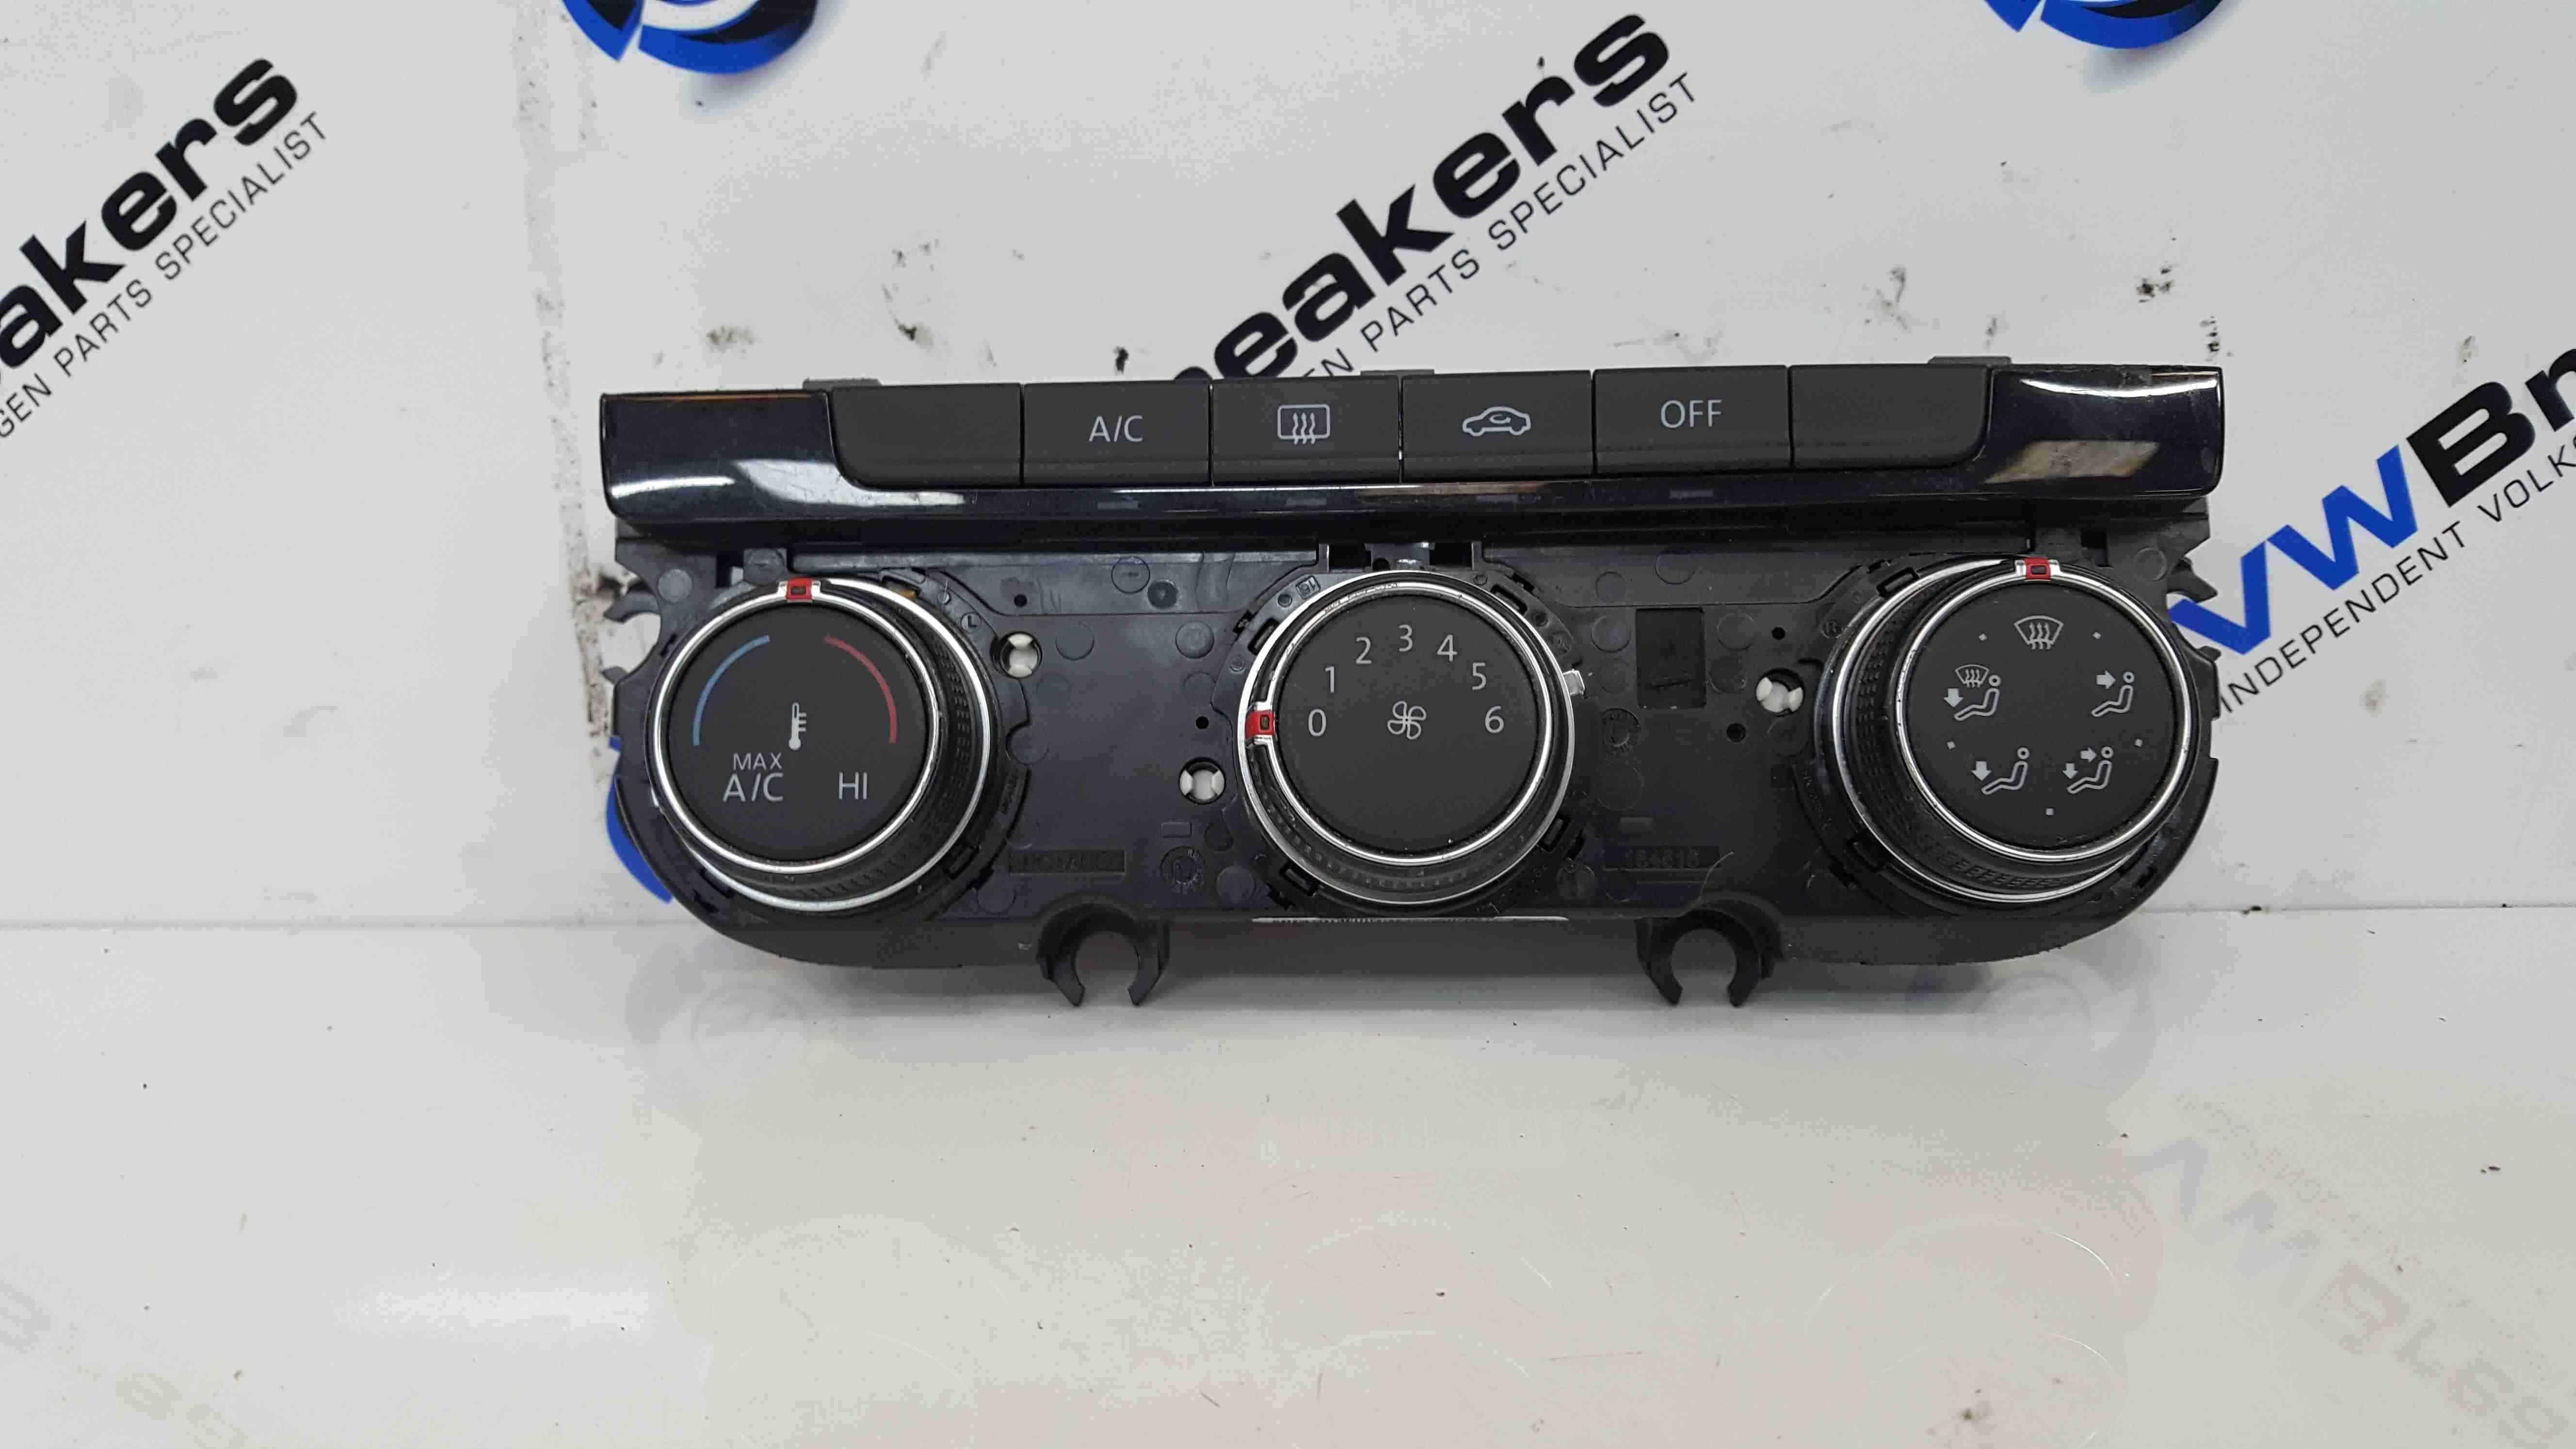 Volkswagen Golf MK7 2012-2017 Heater Controls Climate Control Dials 5G0907426T